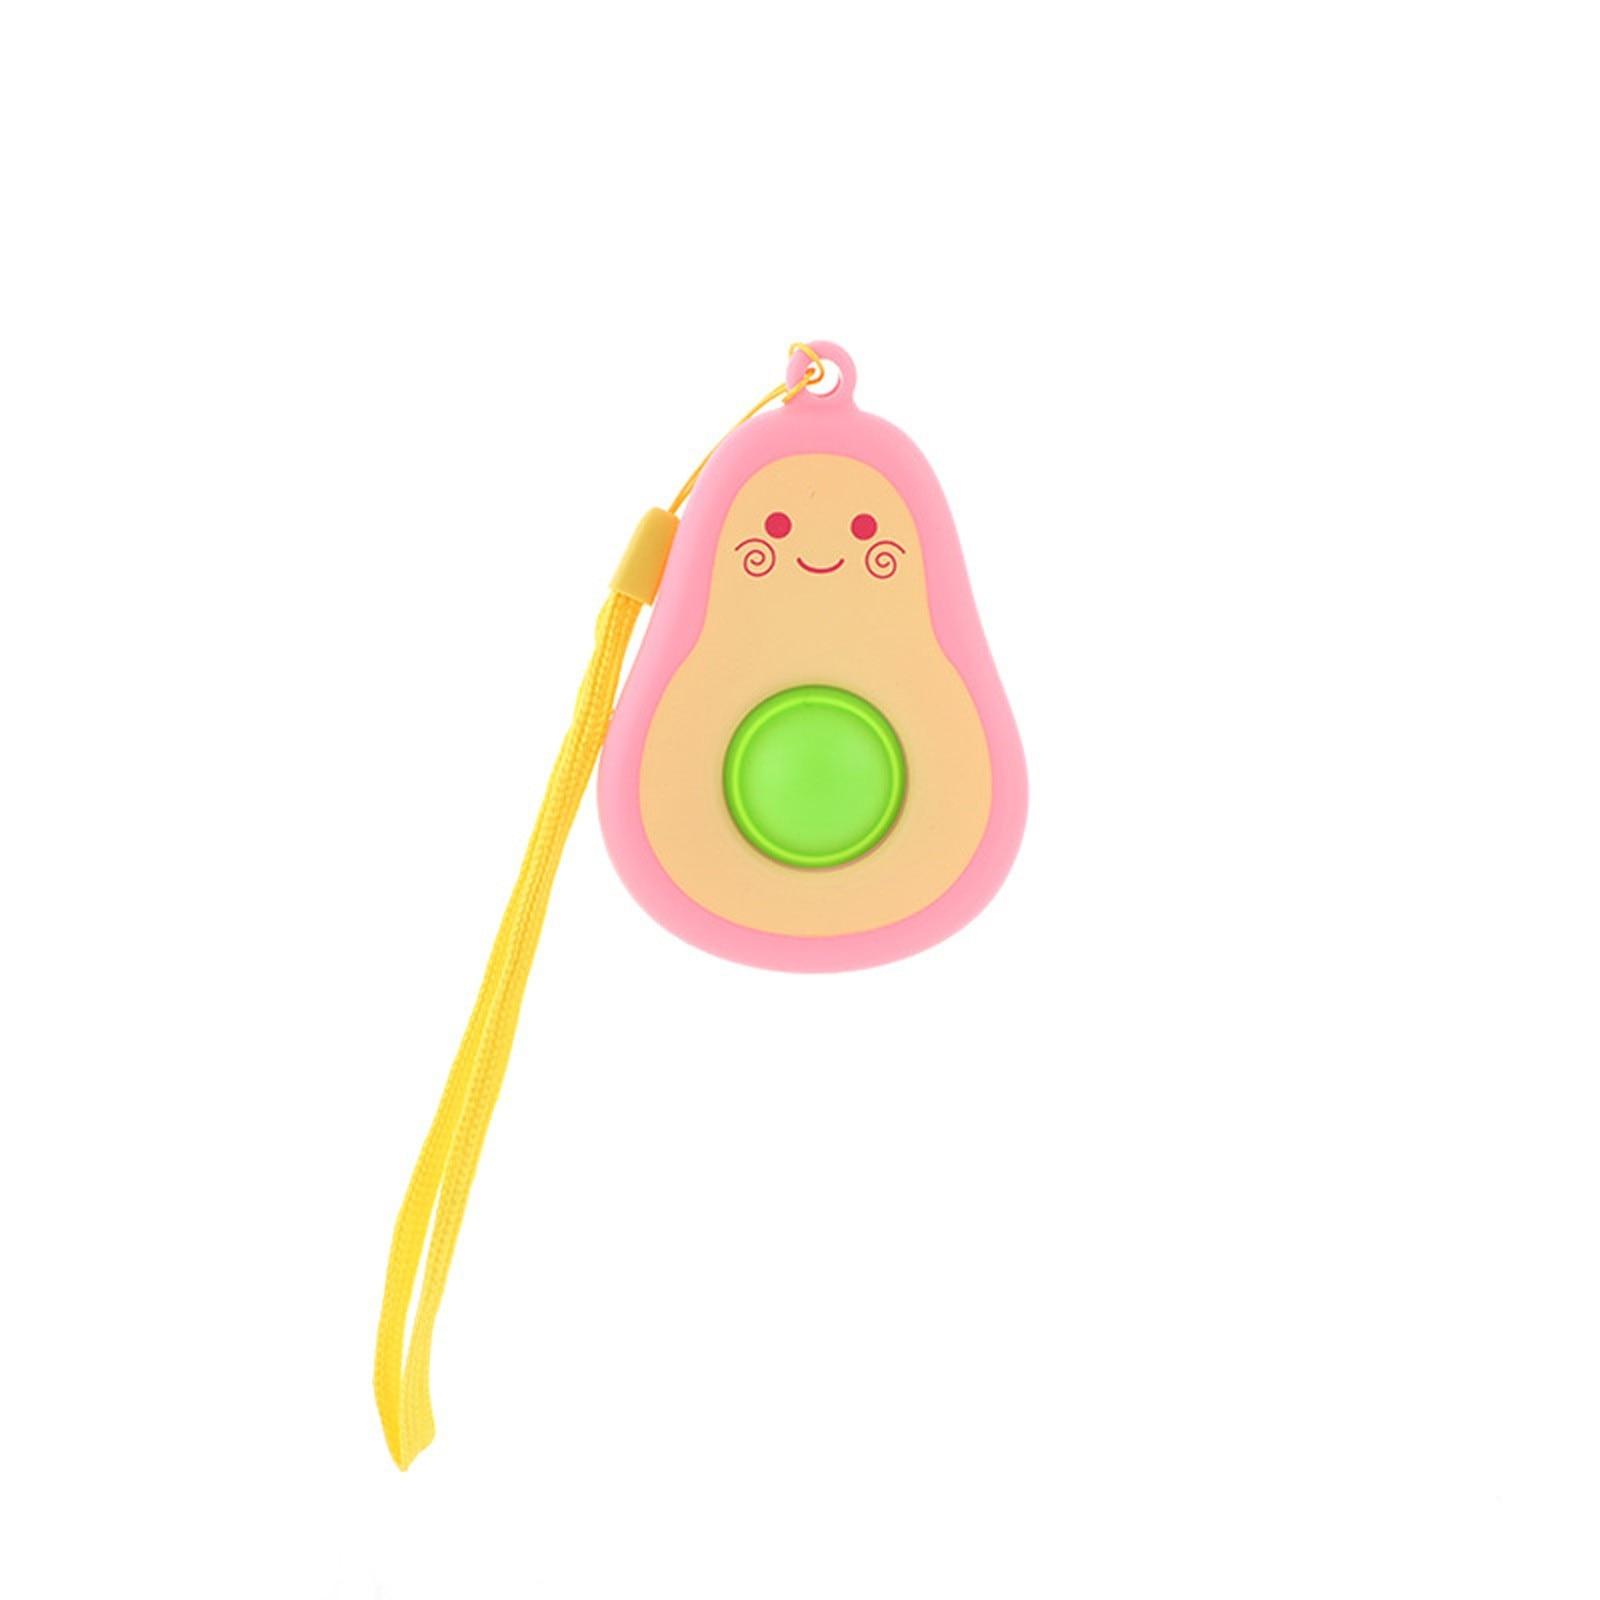 simple dimple avocado fidget toy 3407 - Wacky Track